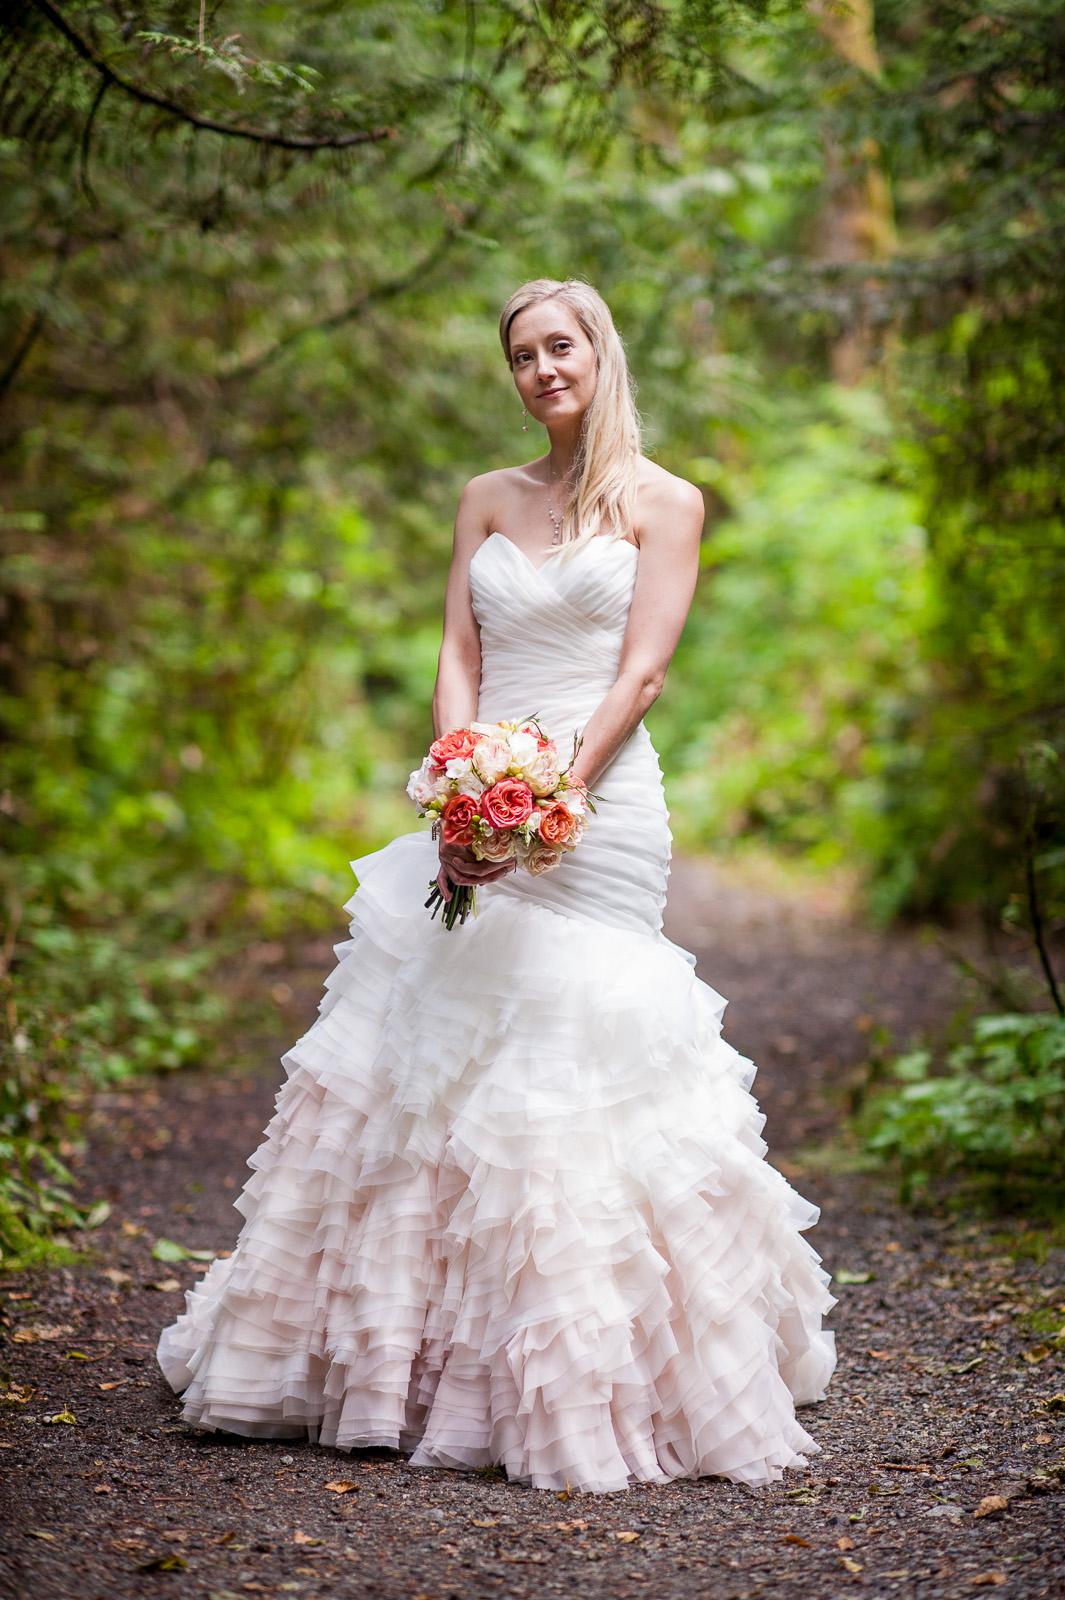 bc-wedding-photographers-cleveland-dam-wedding-17.jpg